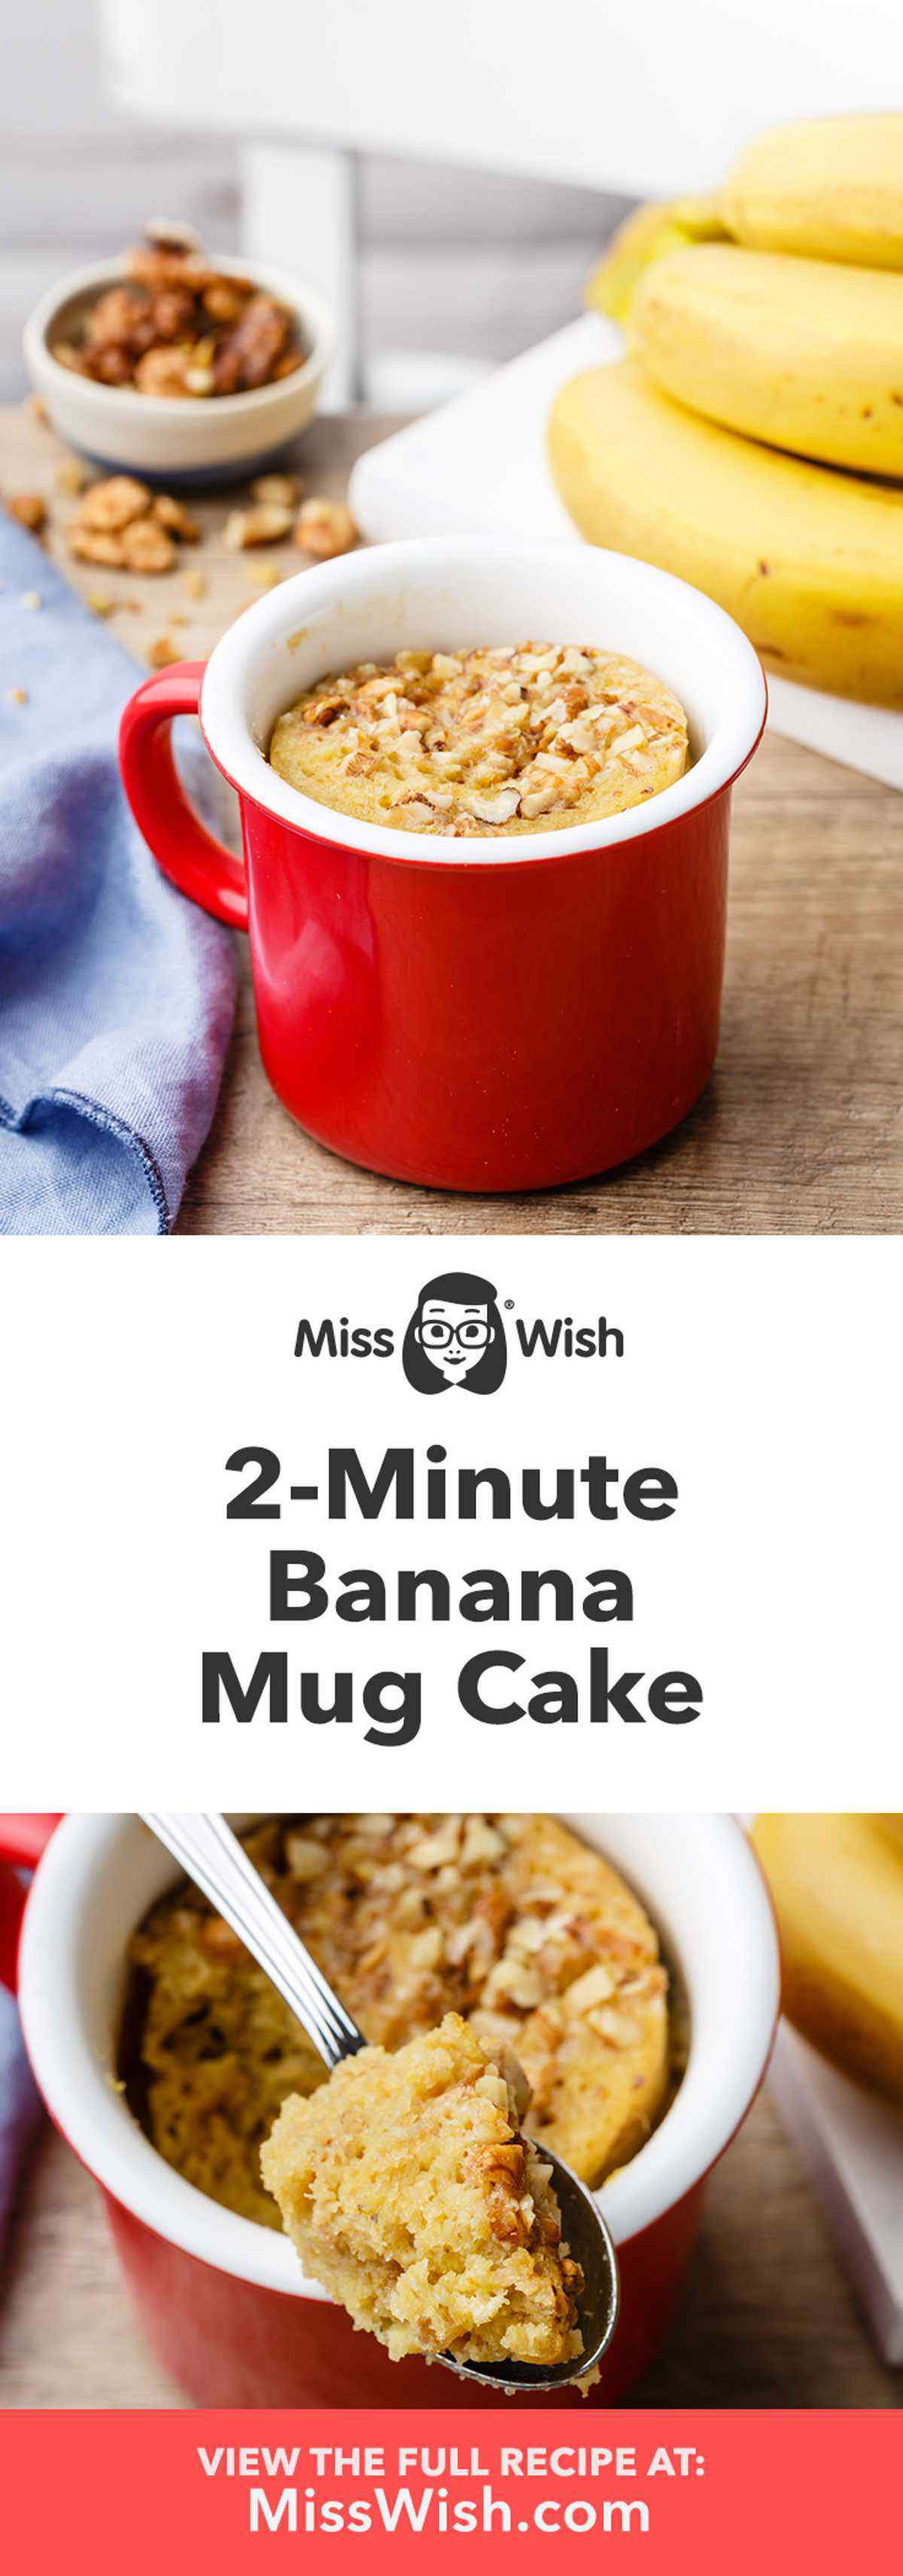 2-Minute Banana Mug Cake